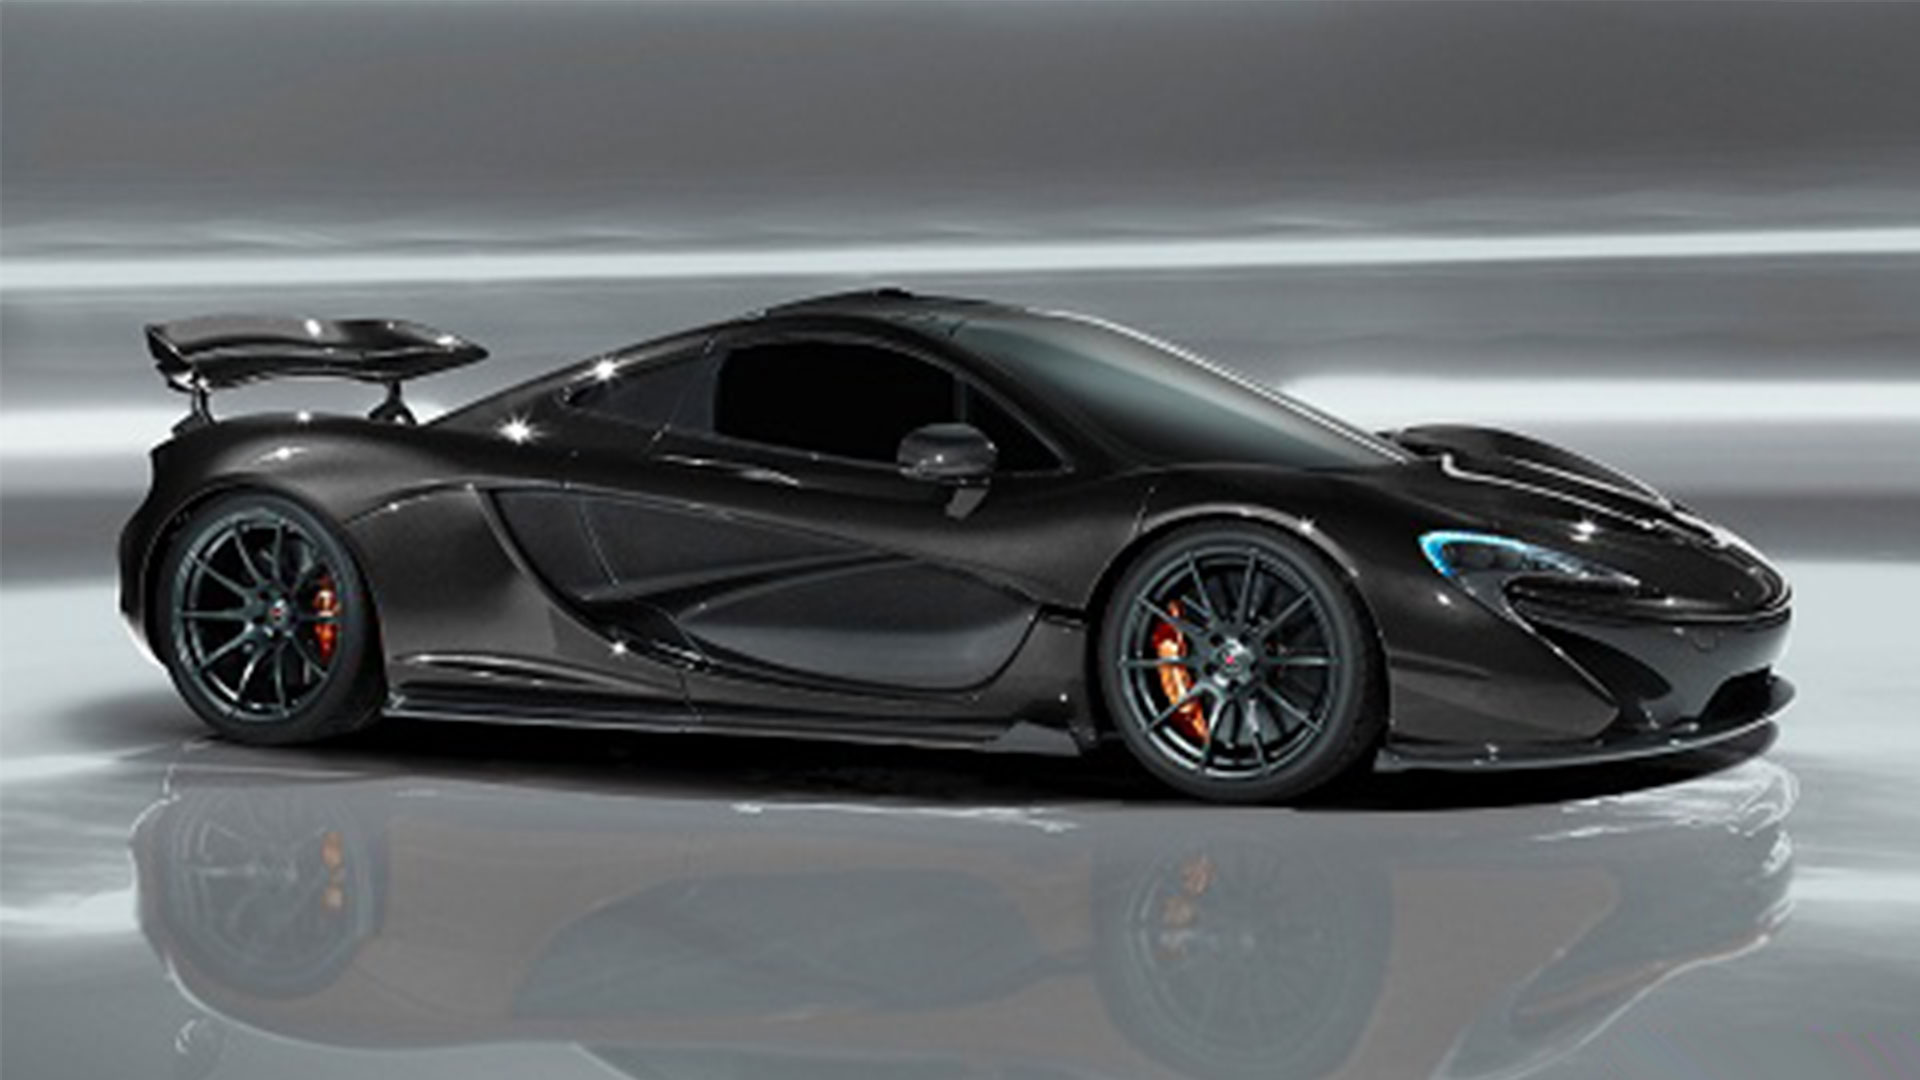 Beautiful McLaren P1 Picture - Cars Desktop Wallpaper